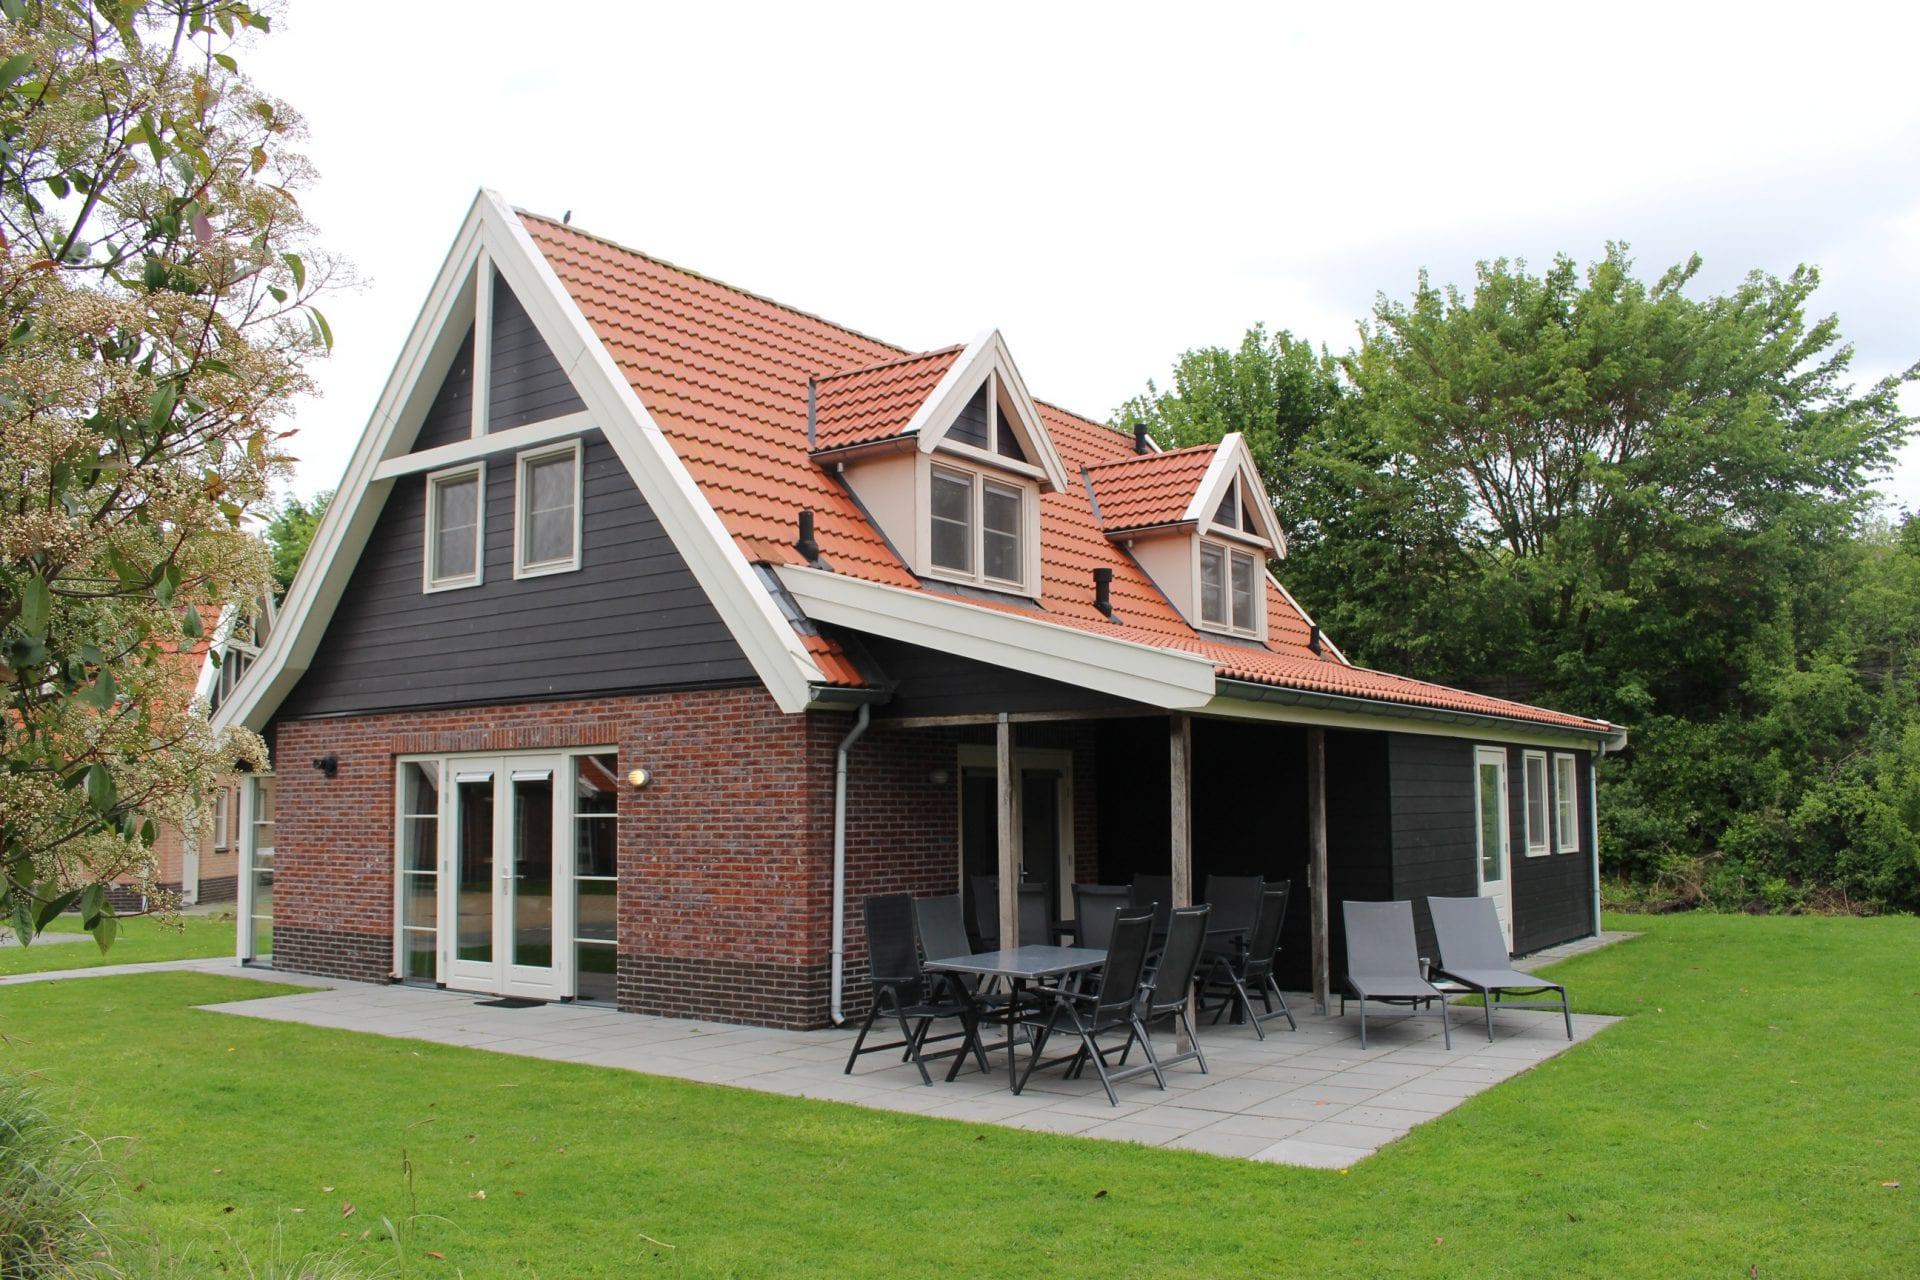 1 Vakantiehuis 1065 Waterparc Veluwemeer 10-pers. Wellness